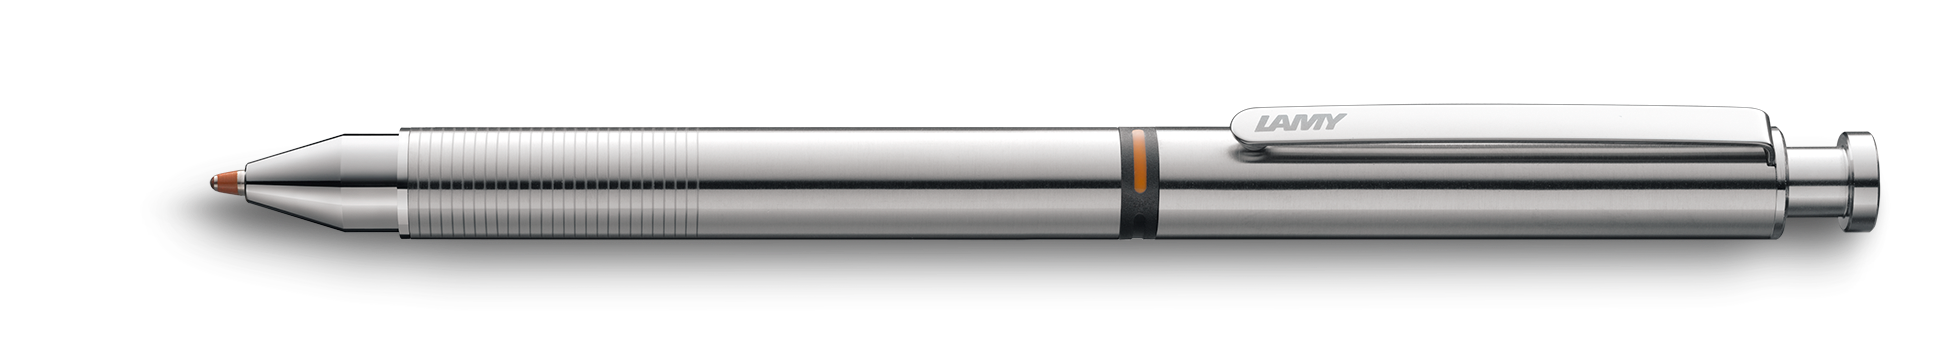 LAMY st tri pen (2+1) Multisistema